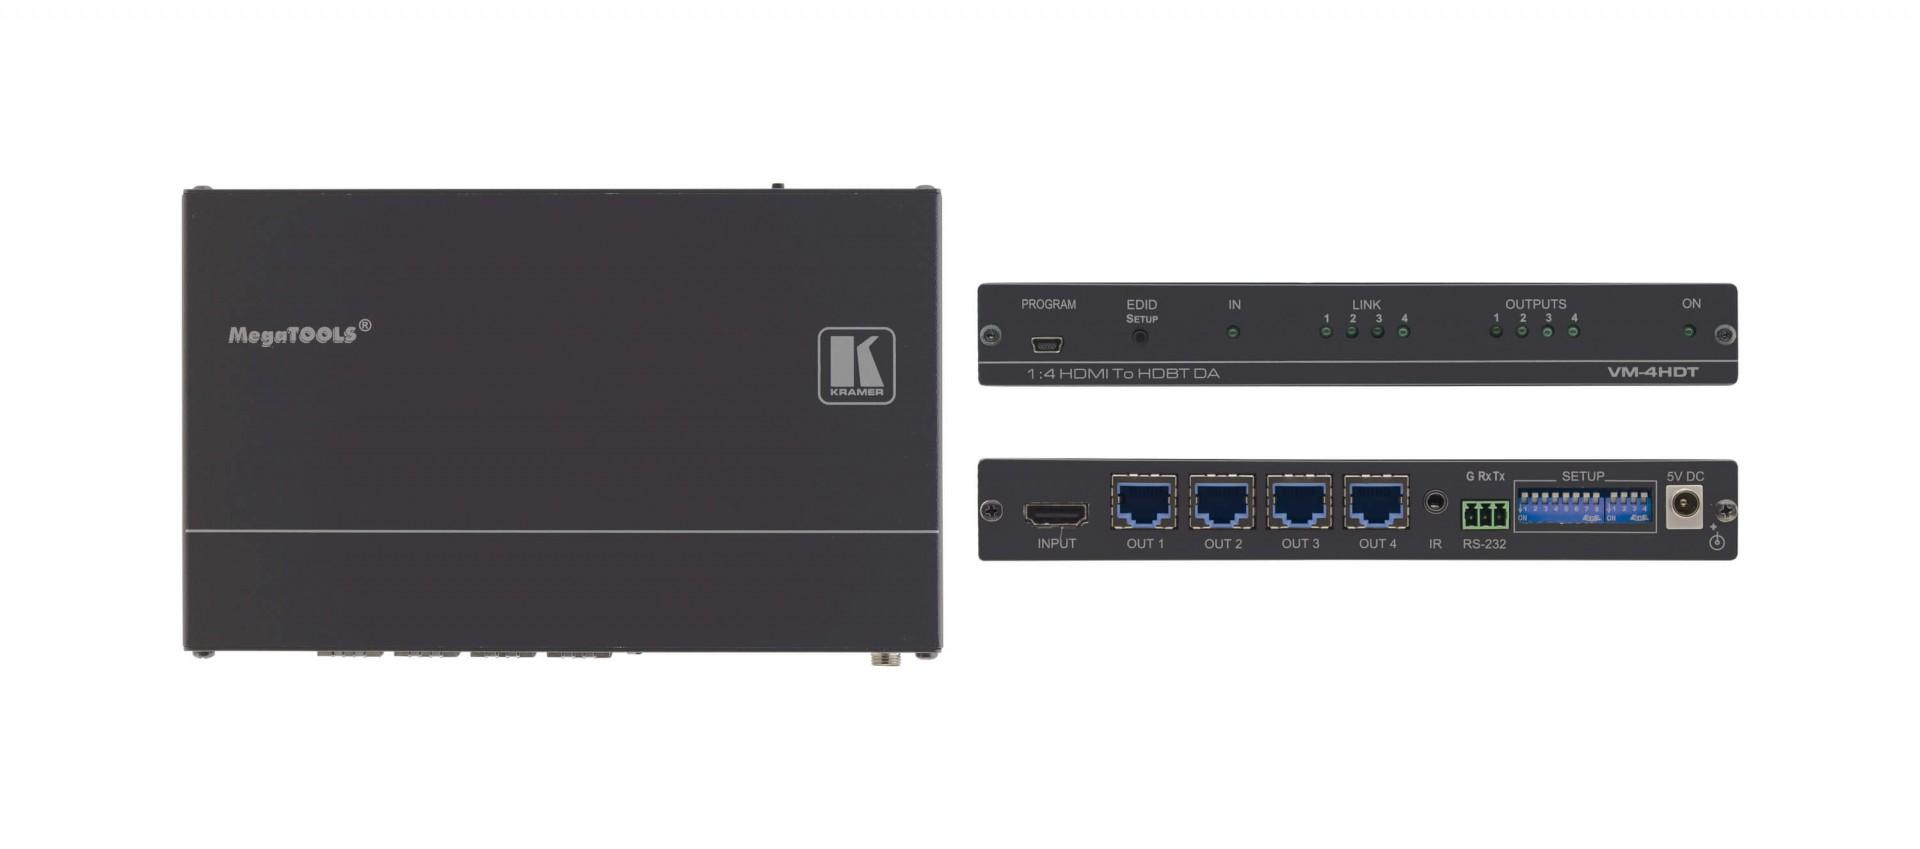 Kramer VM-4HDT 1:4 4K60 4:2:0 HDMI to Long–Reach HDBaseT distribution amplifier